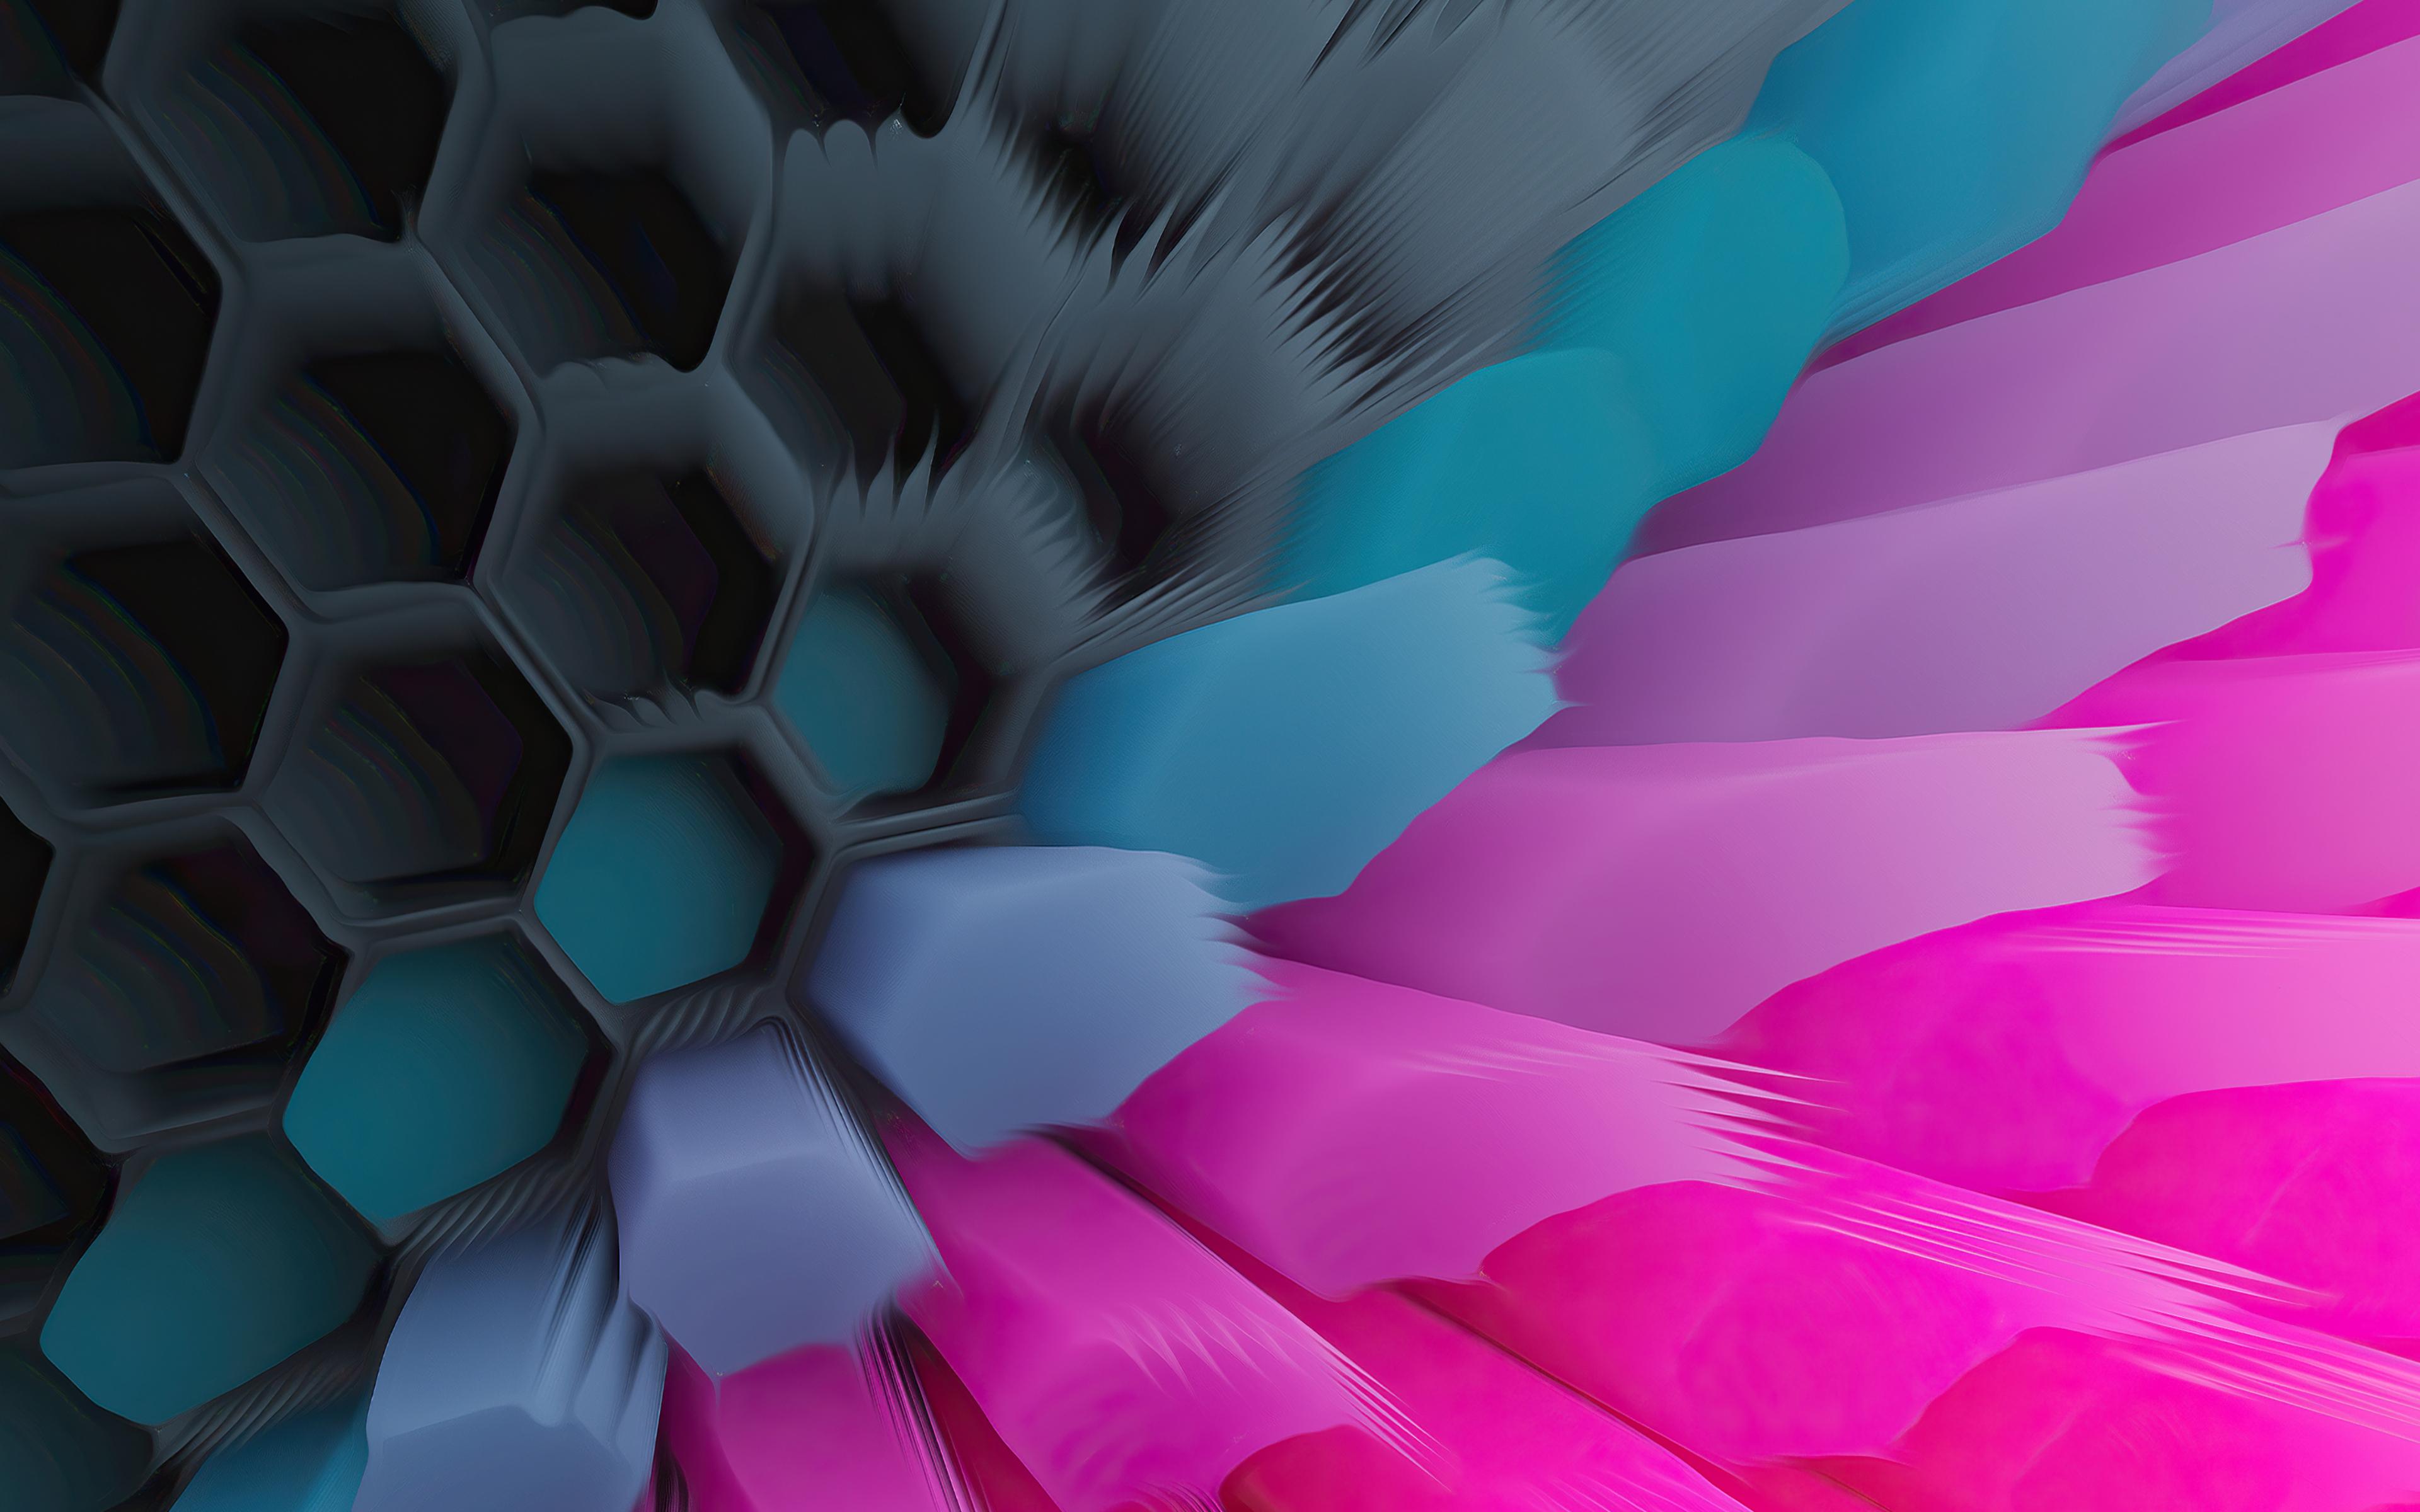 new-bringing-abstract-4k-hl.jpg